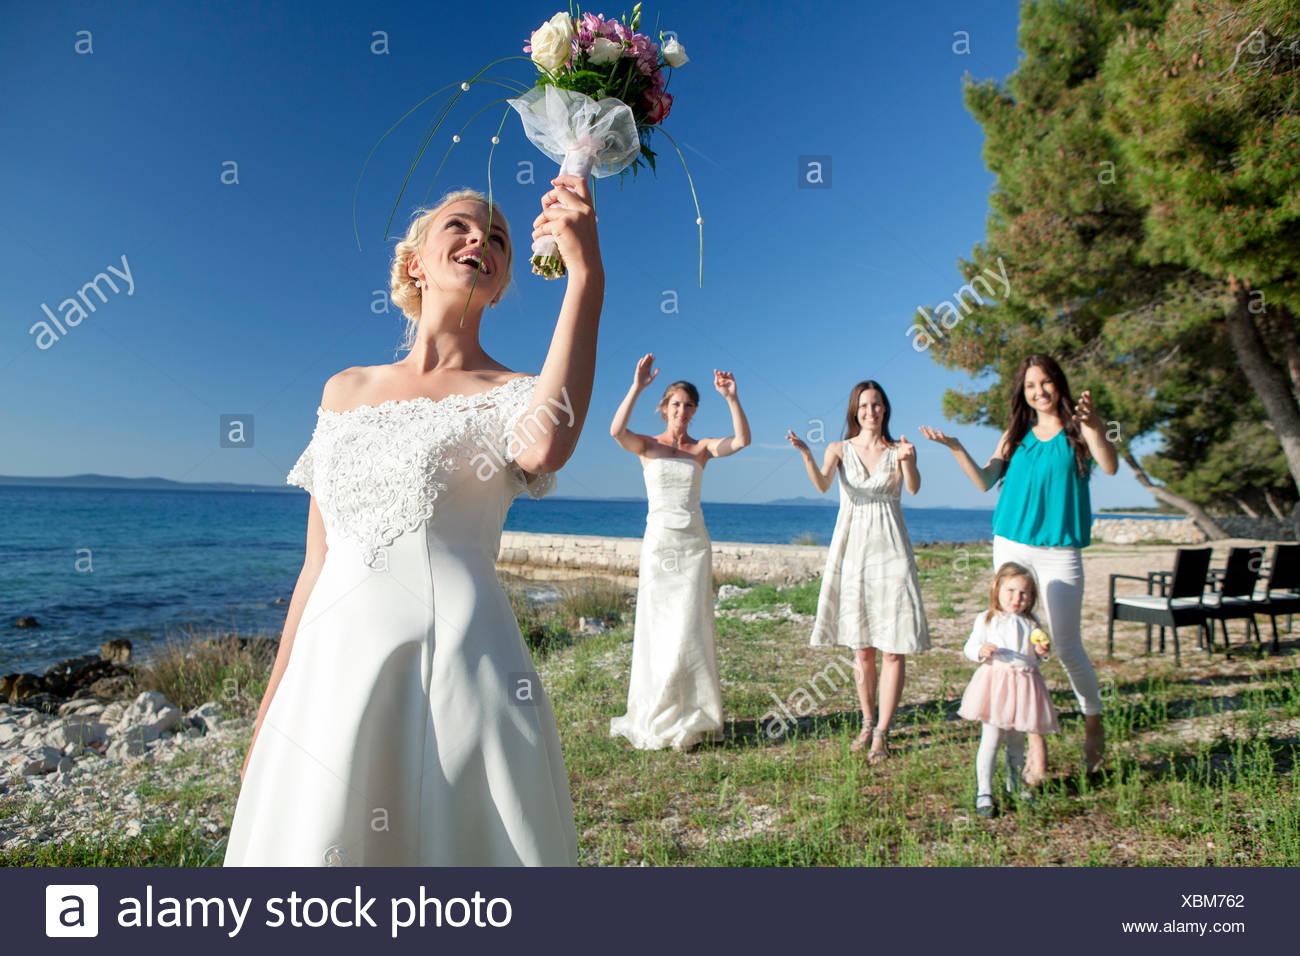 Bride Throwing Bouquet At Wedding Reception Stock Photo 282571802